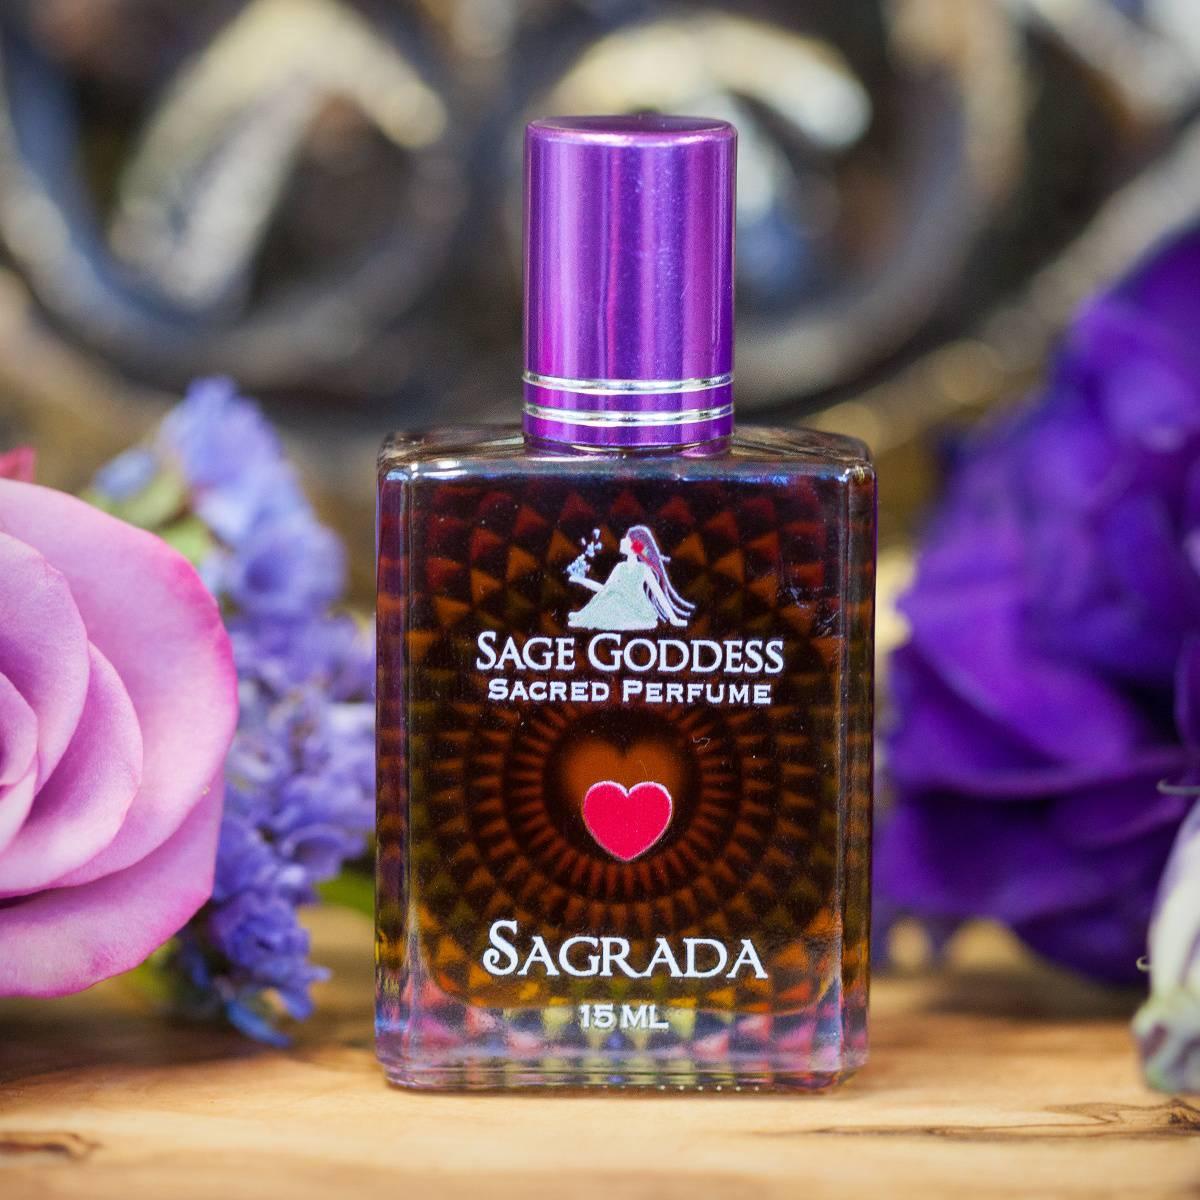 Sagrada_Perfume_with_Apothecary_Bottle_2of3_7_15